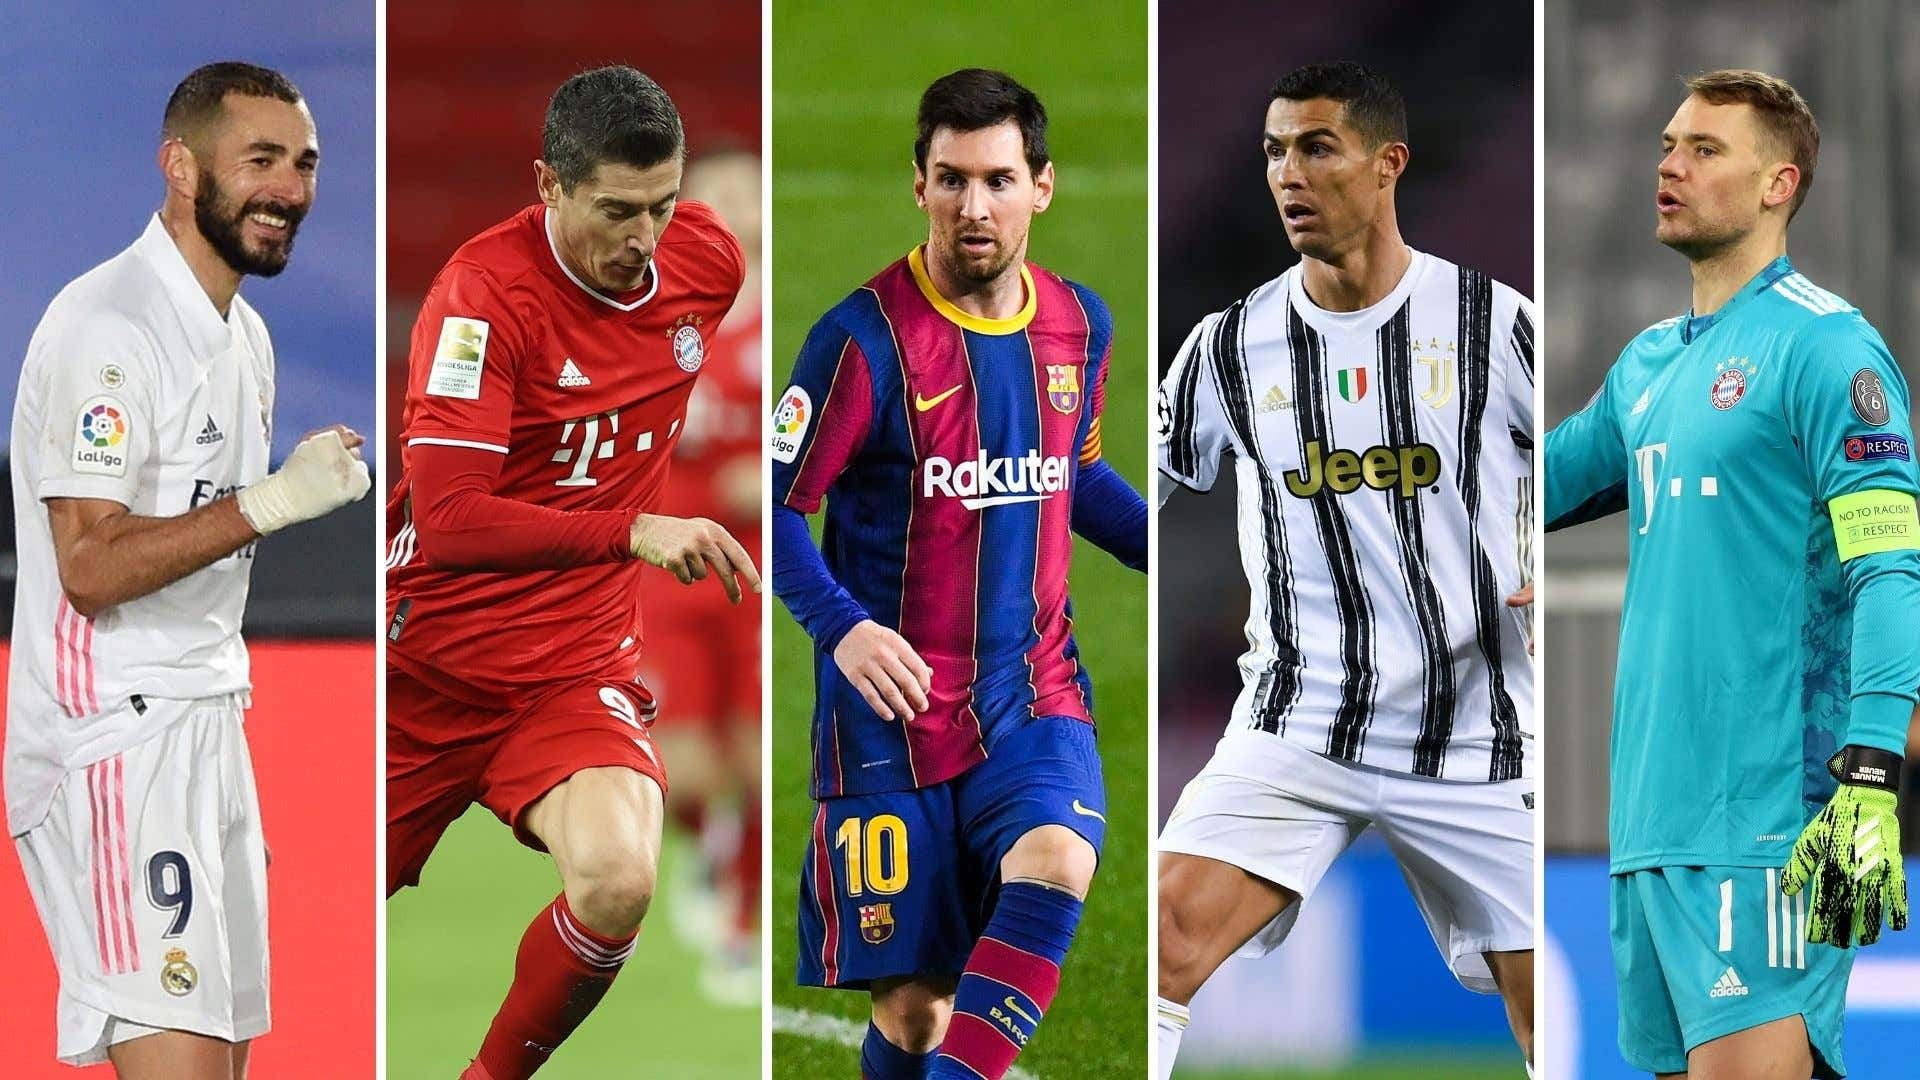 Benzema, Lewandowski, Messi, Cristiano Ronaldo y Neuer (Real Madrid, Bayern, Barcelona, Juventus y Bayern)